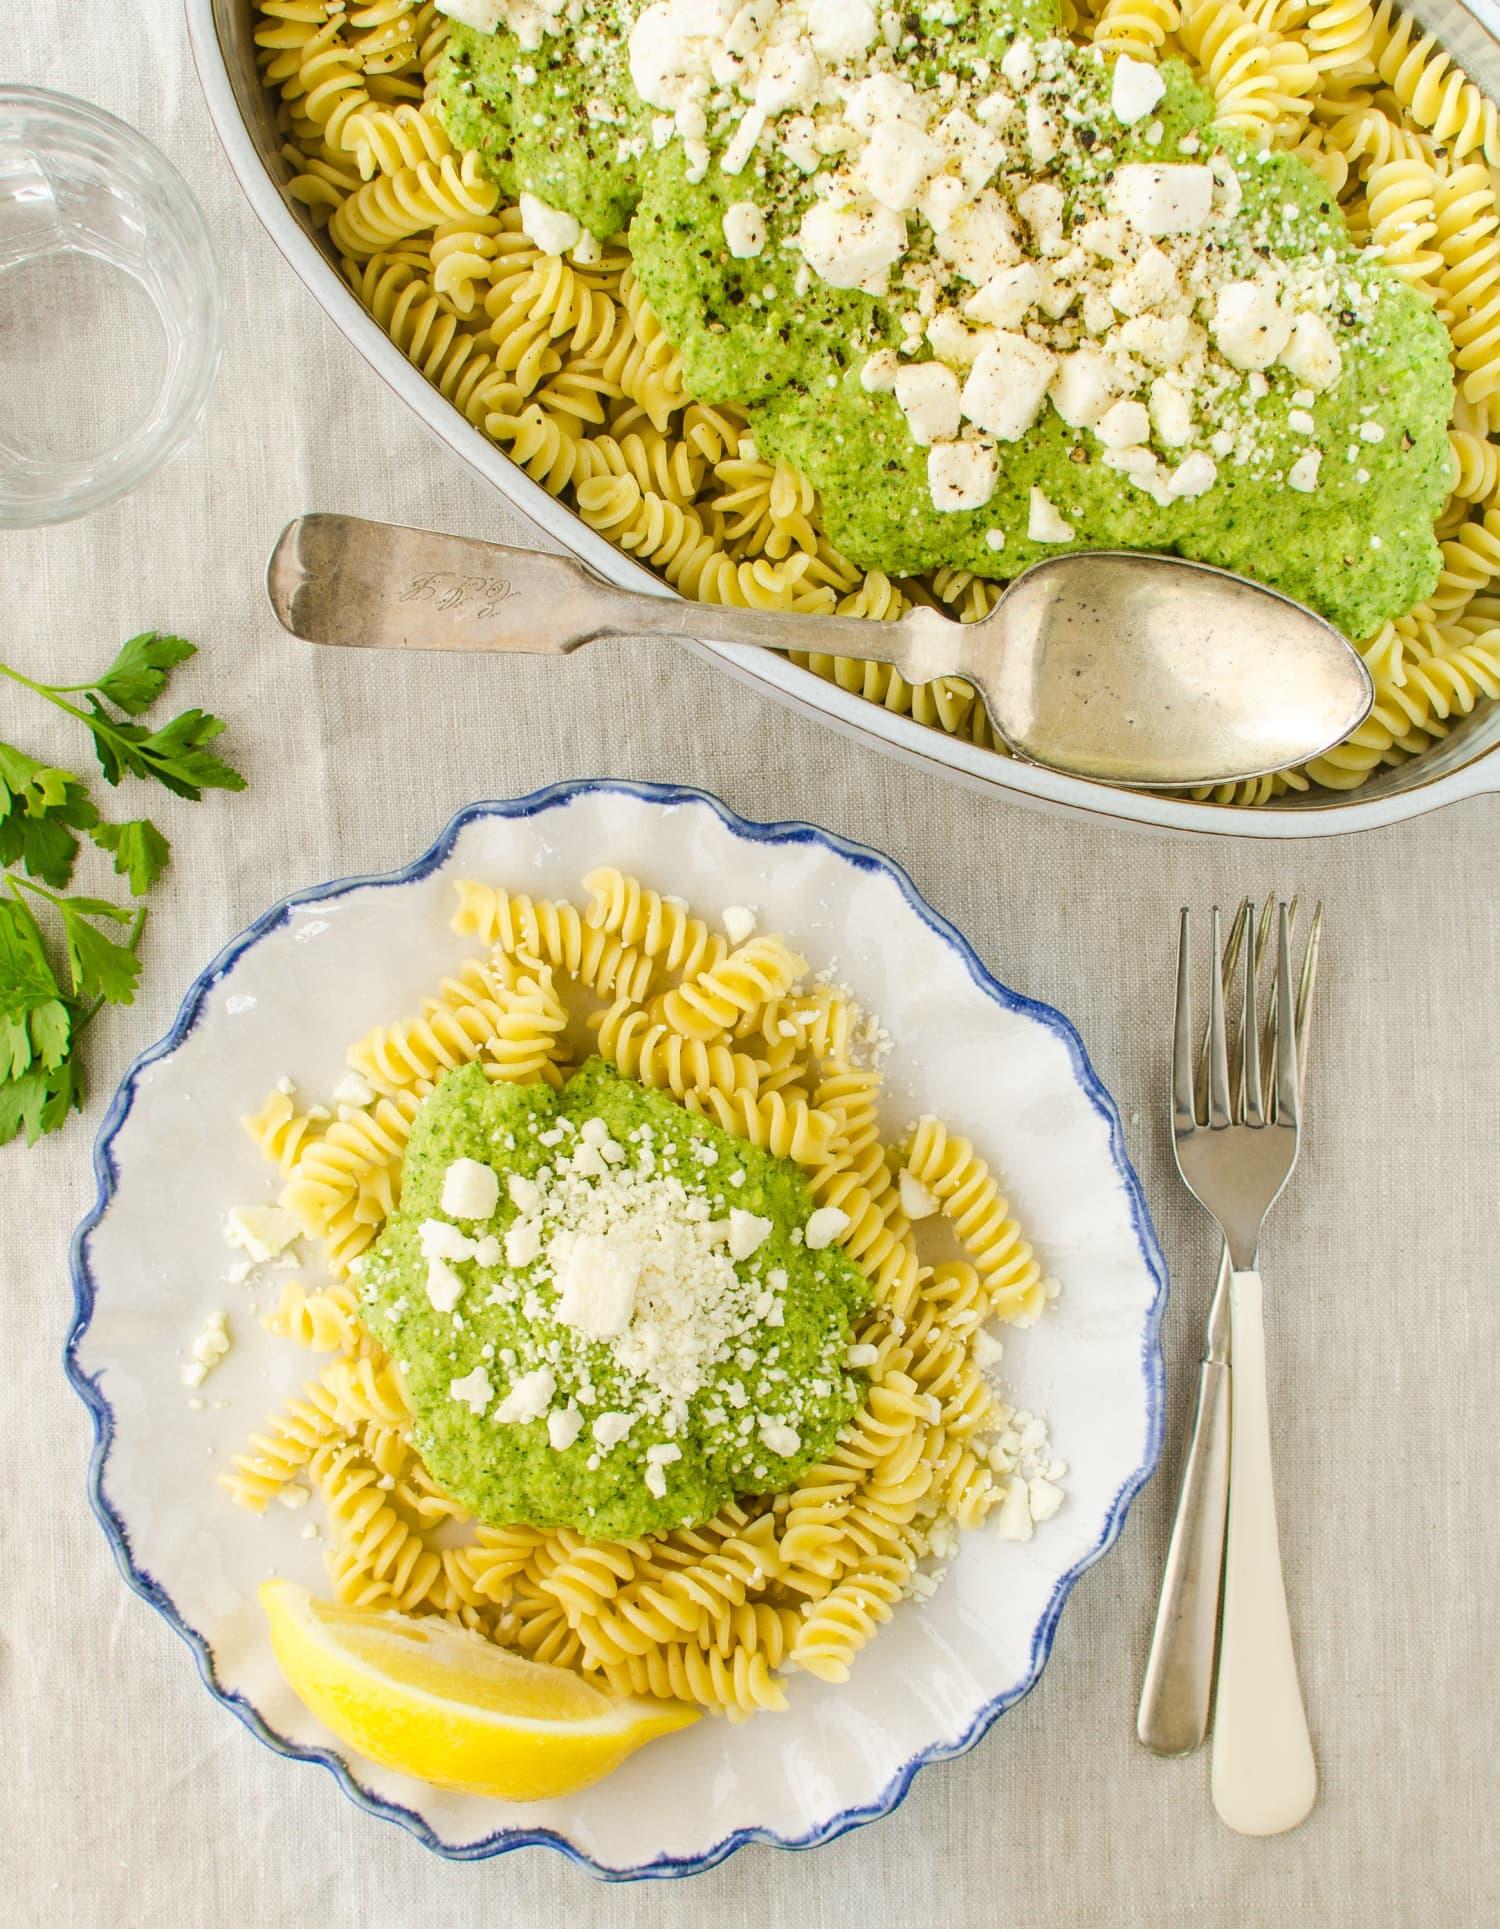 10 Ways to Turn Frozen Broccoli into Dinner